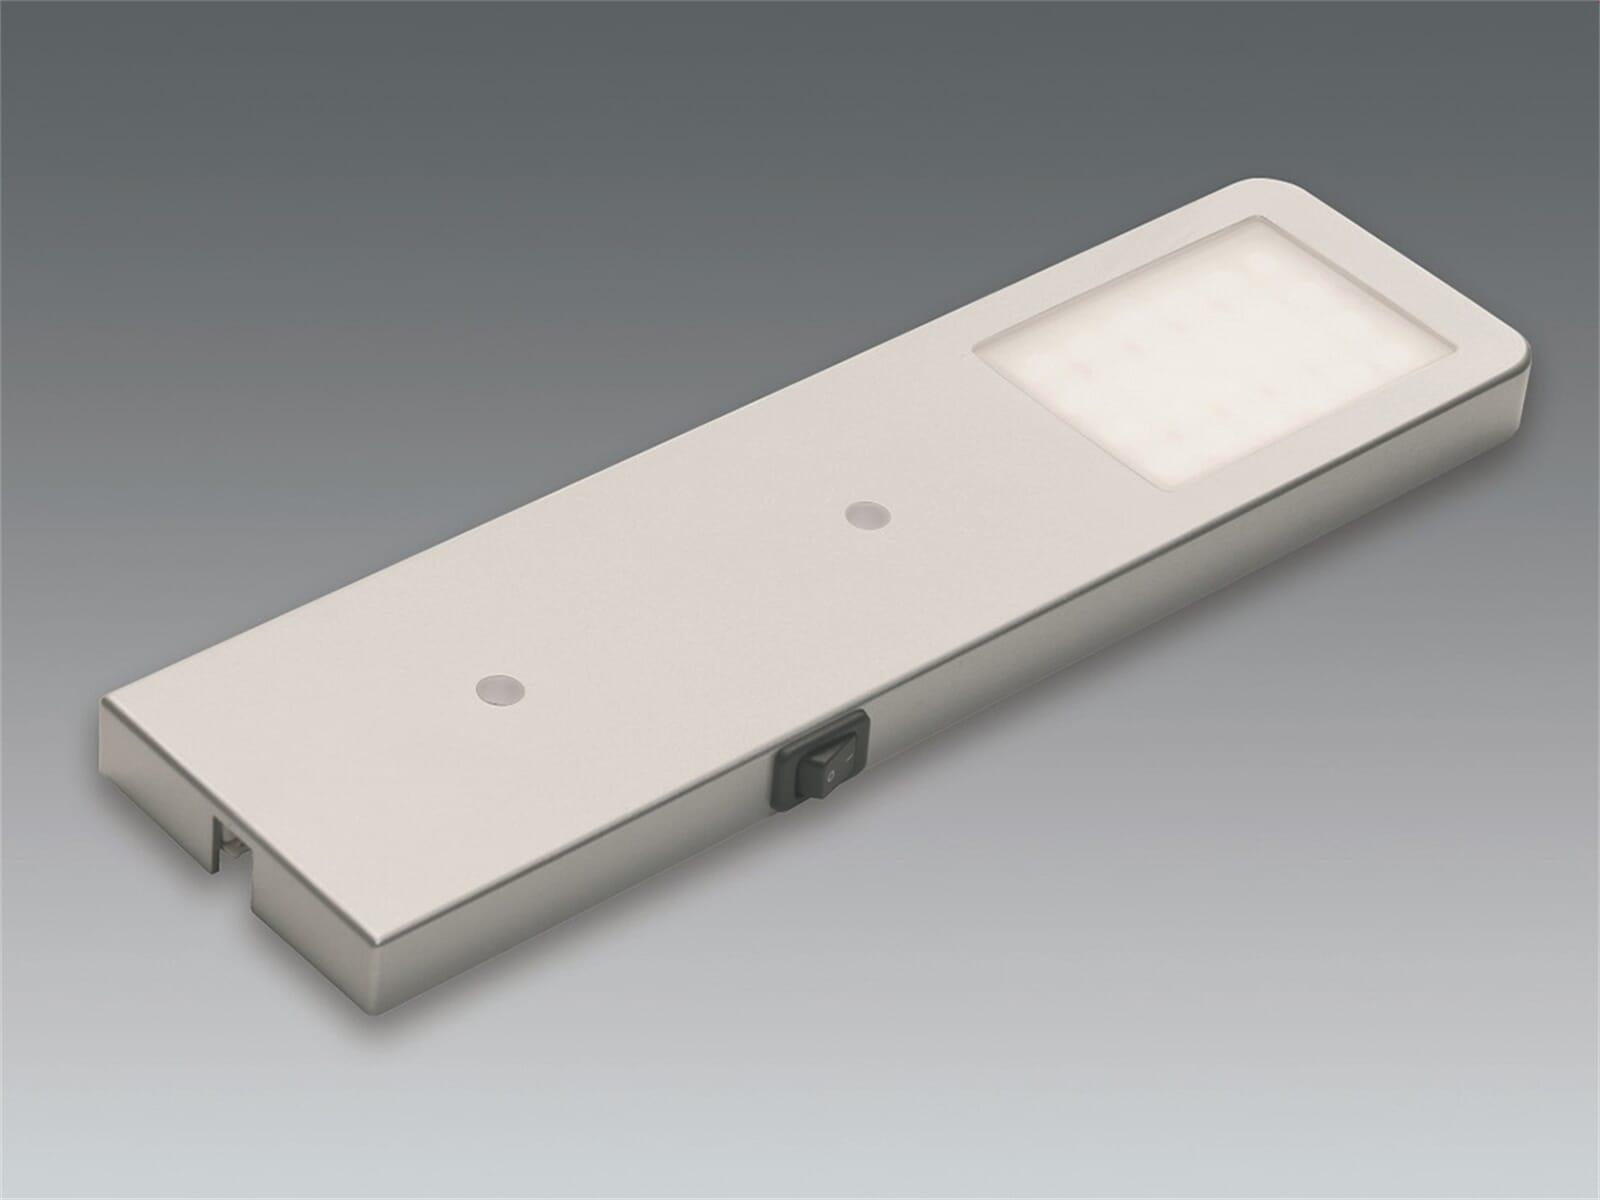 Prodkutabbildung ELEKTRA EcoLong LED Schalterleuchte